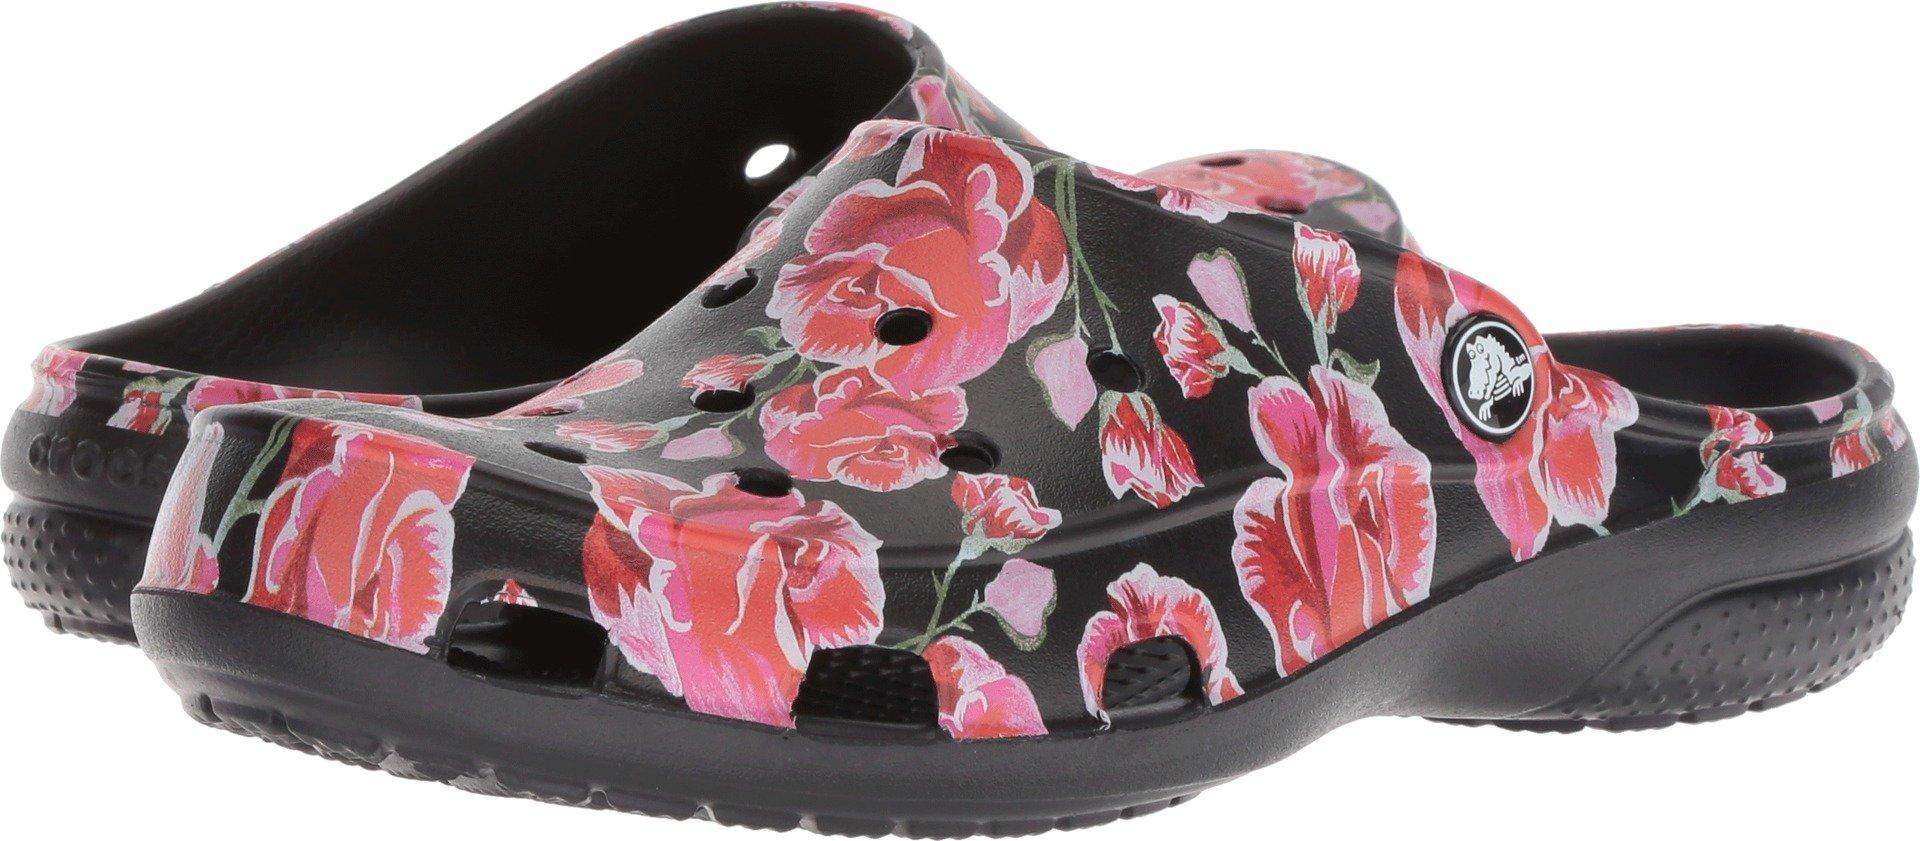 Crocs Women's Freesail Graphic W Clog, Multi Rose/Black, 7 M US